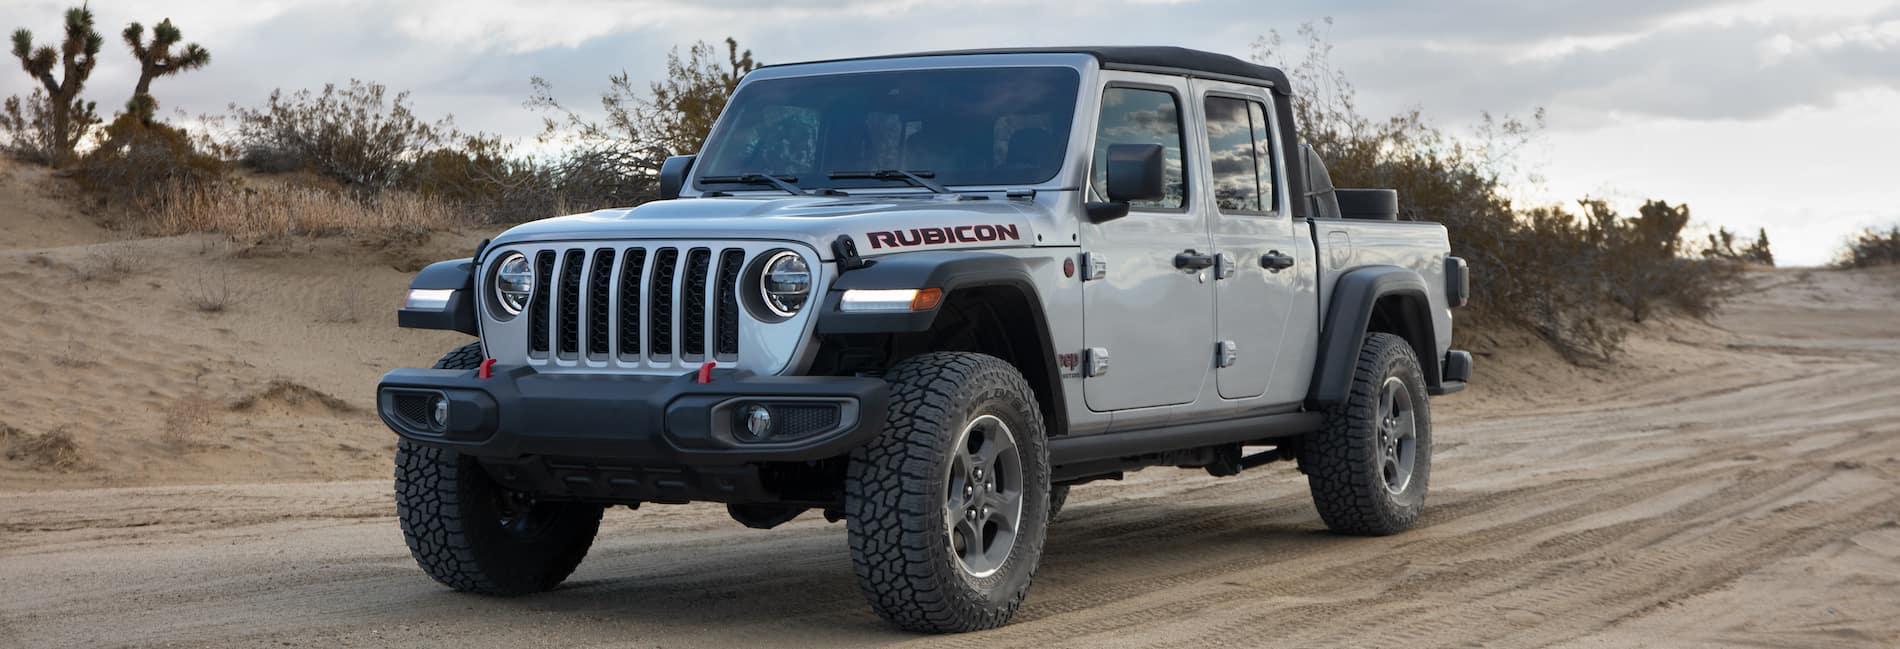 Jeep Gladiator Silver